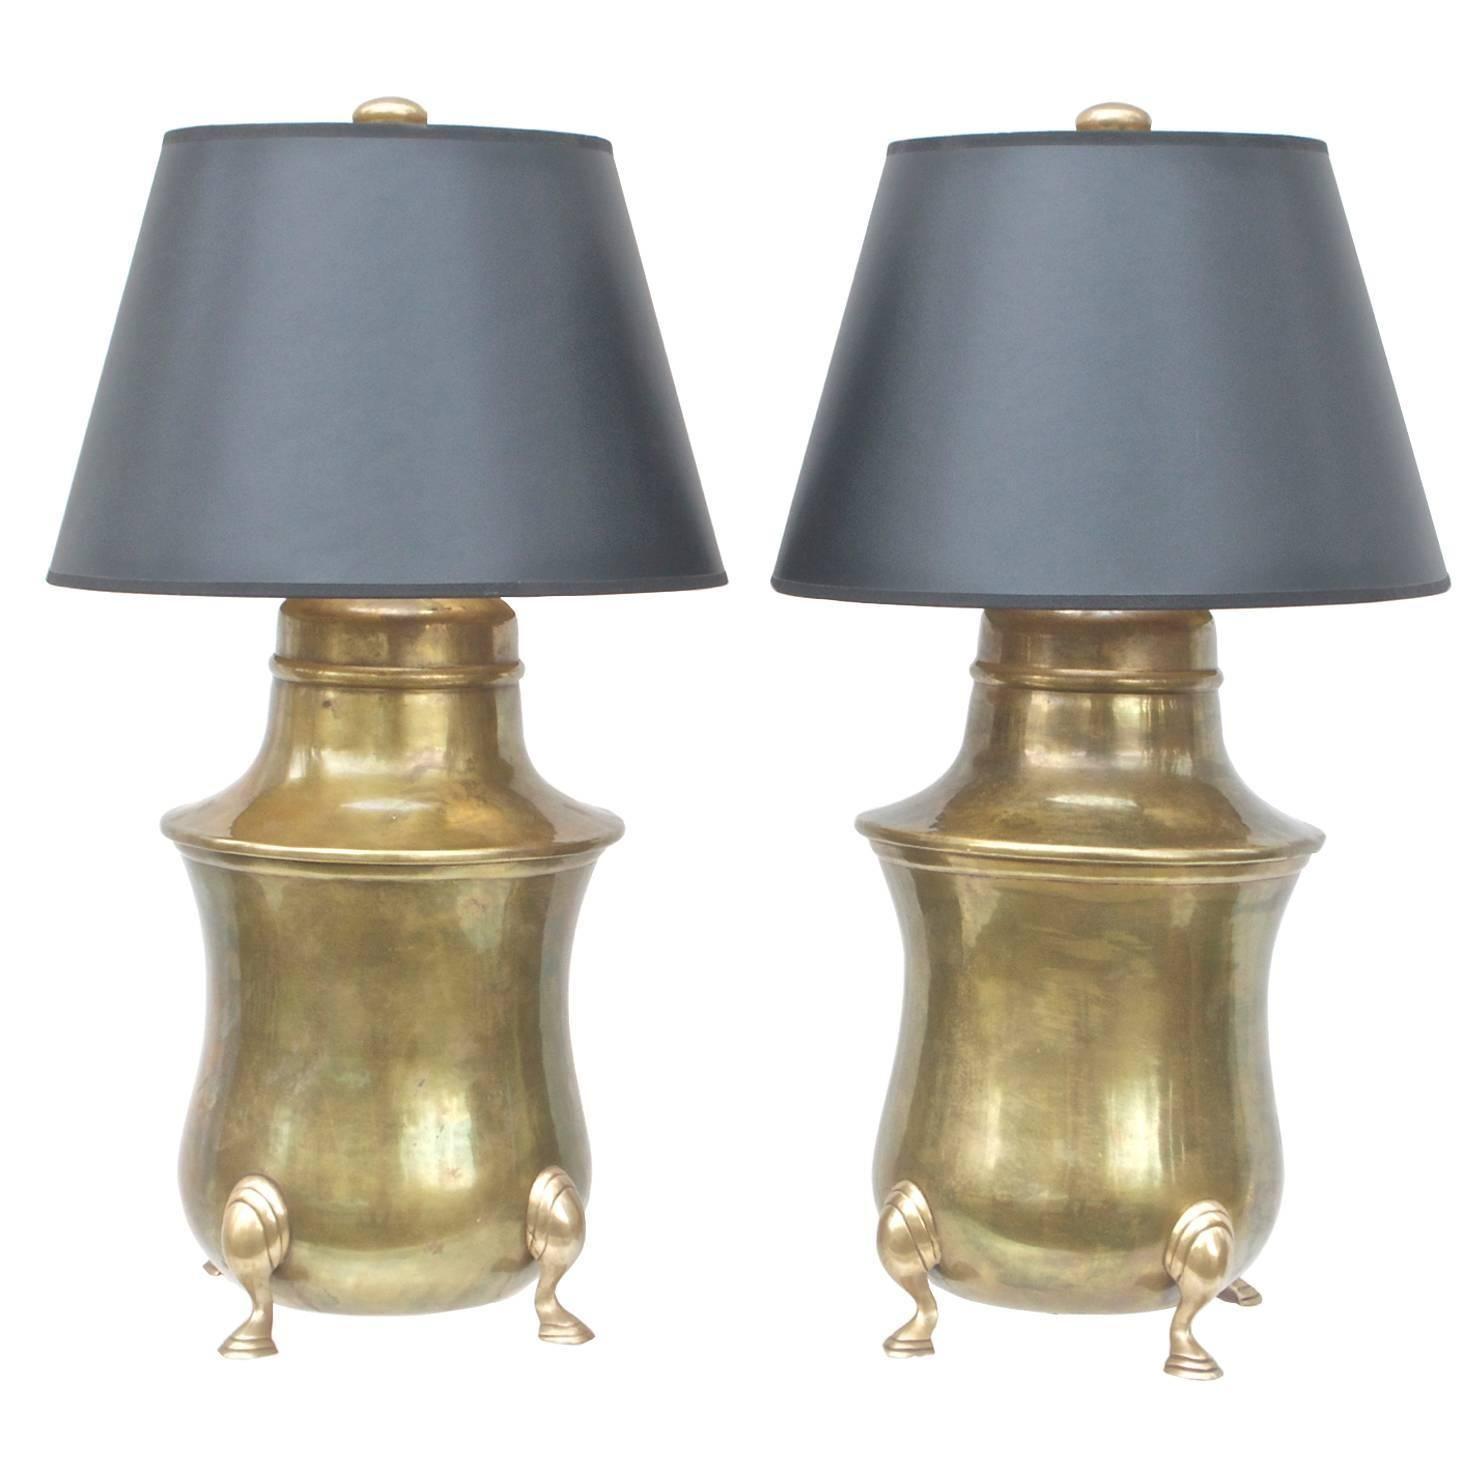 Chapman Brass Lamps of Kettle Form | 1stdibs.com